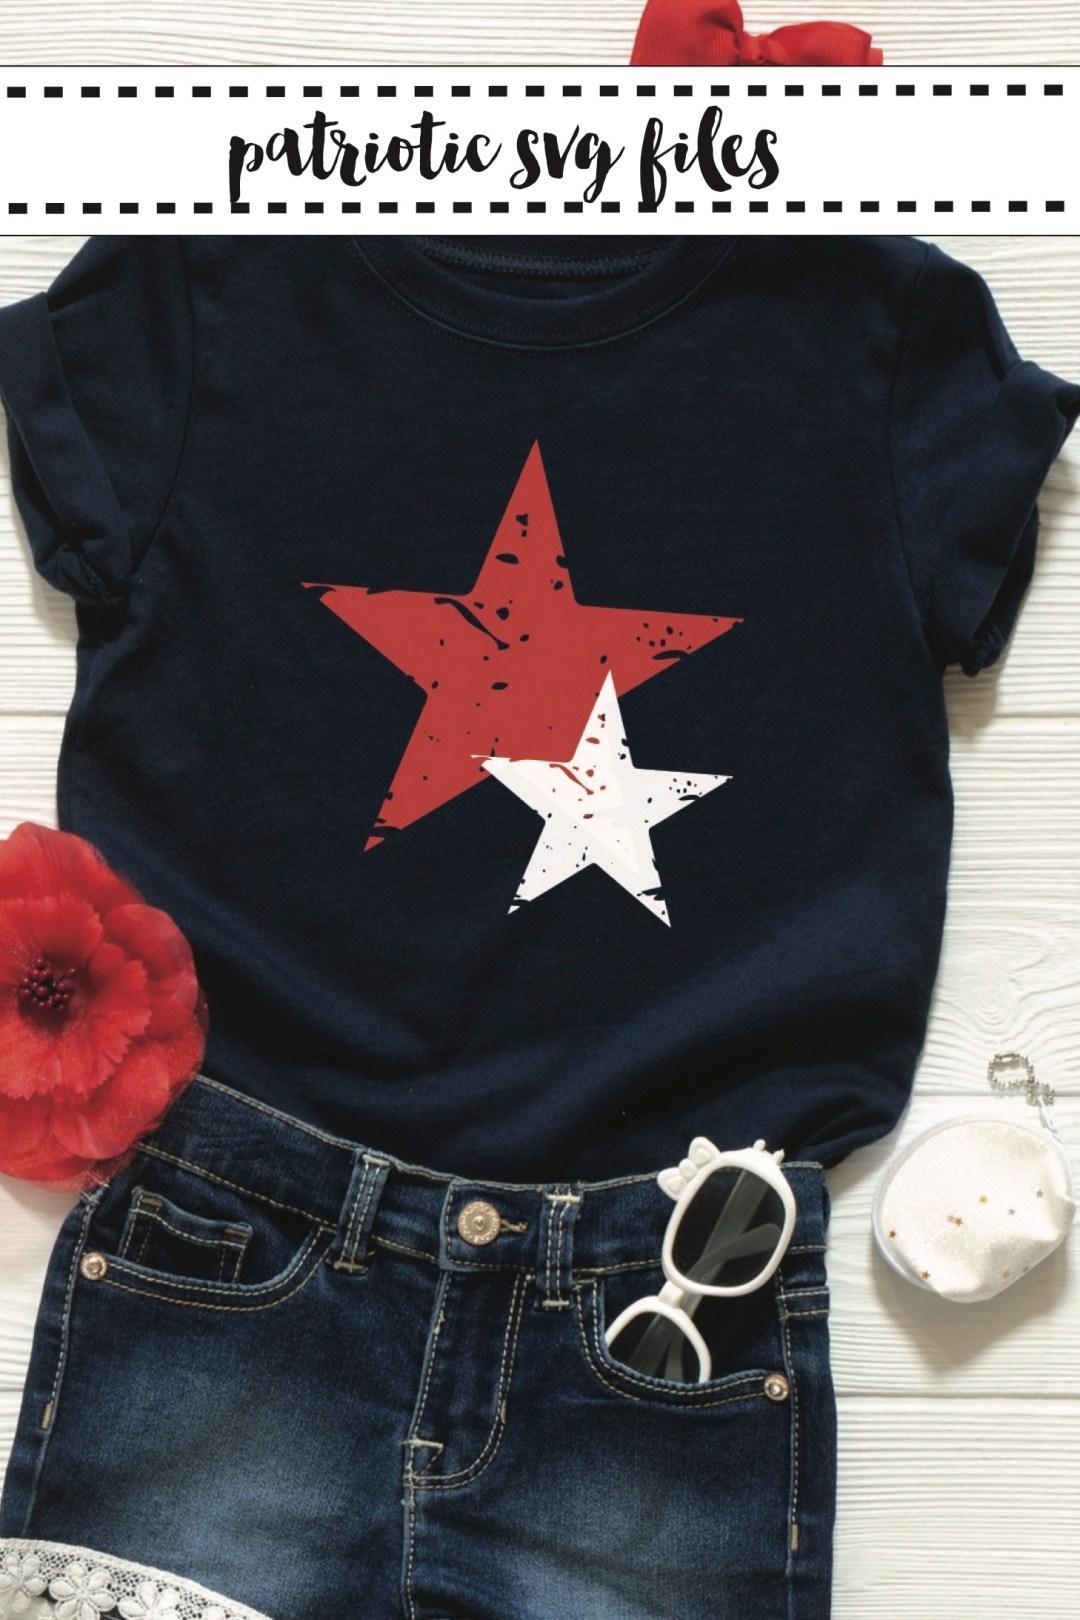 Patriotic Shirt Flower Sunglasses